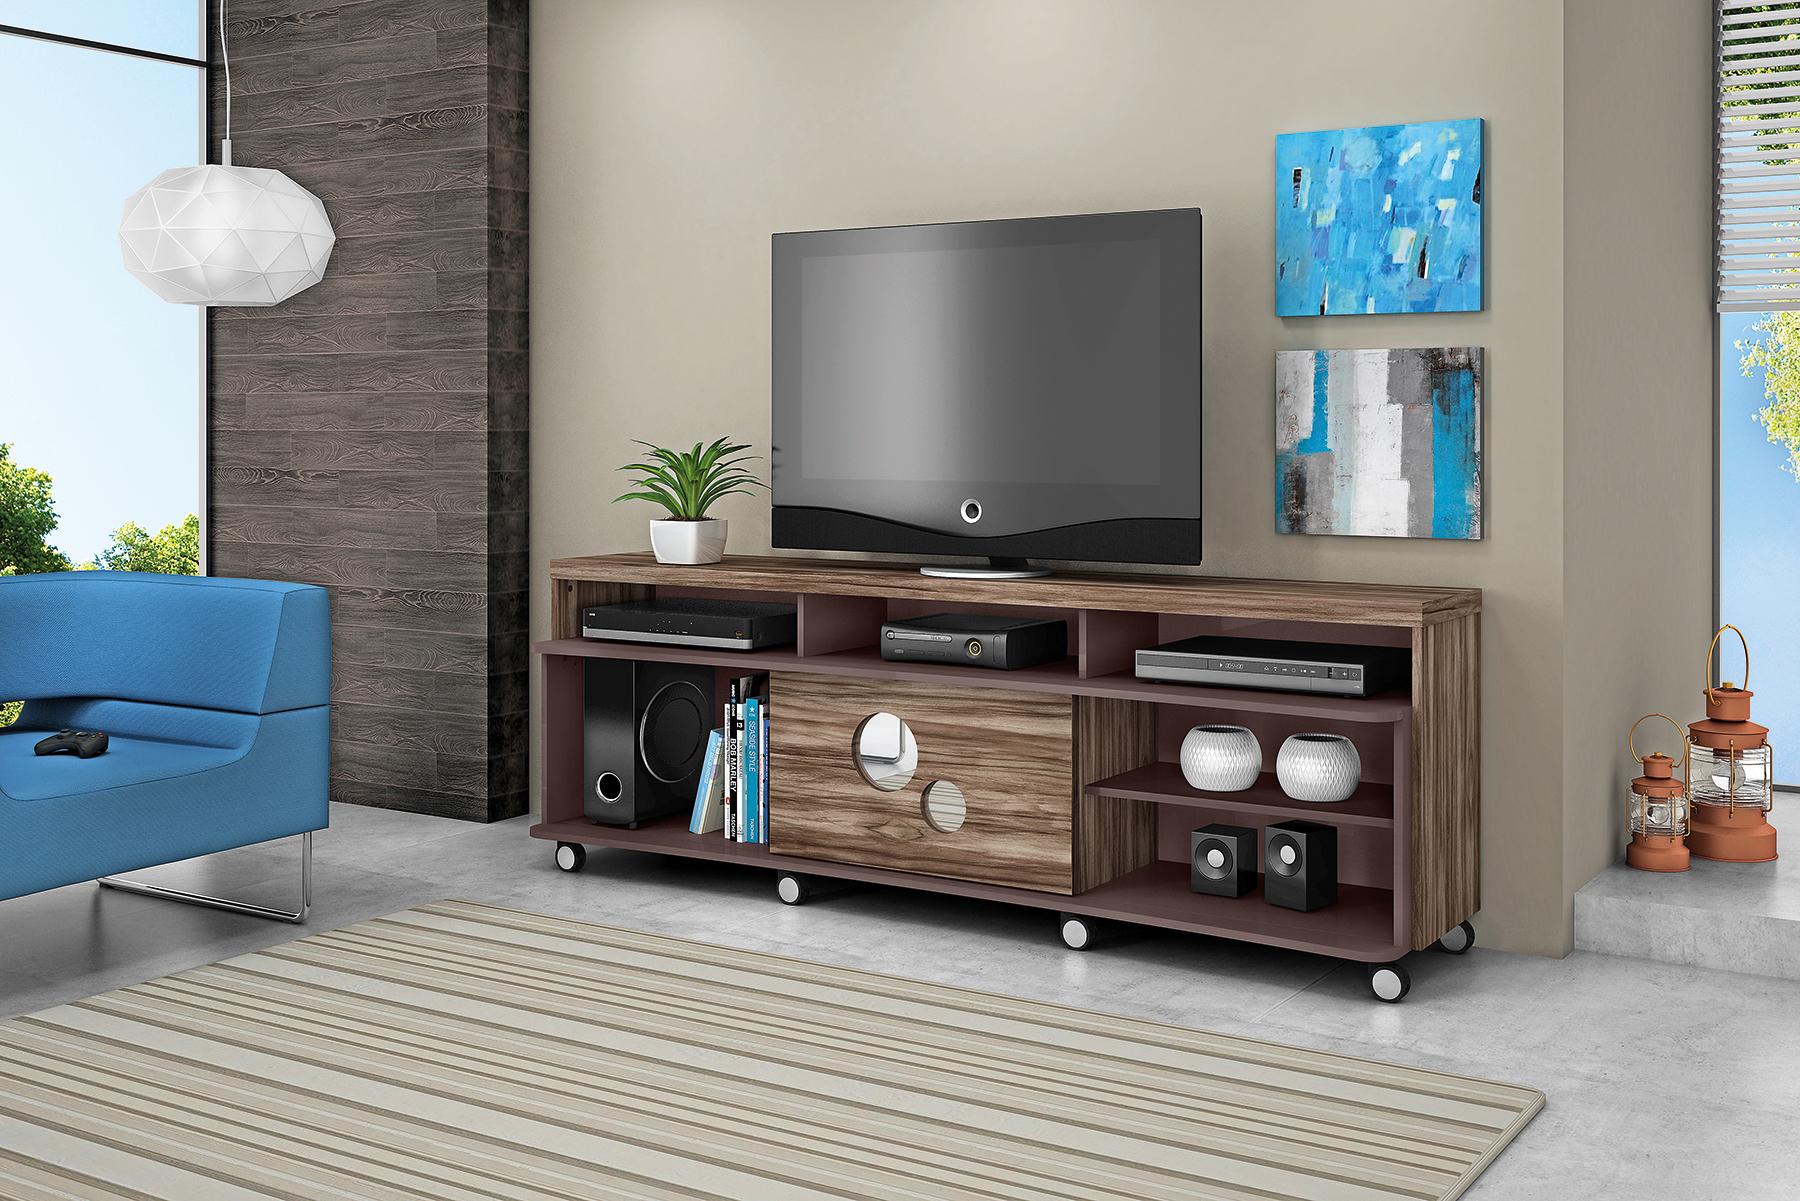 Muebles Para Equipo Idea Creativa Della Casa E Dell Interior Design # Muebles Equipo De Sonido